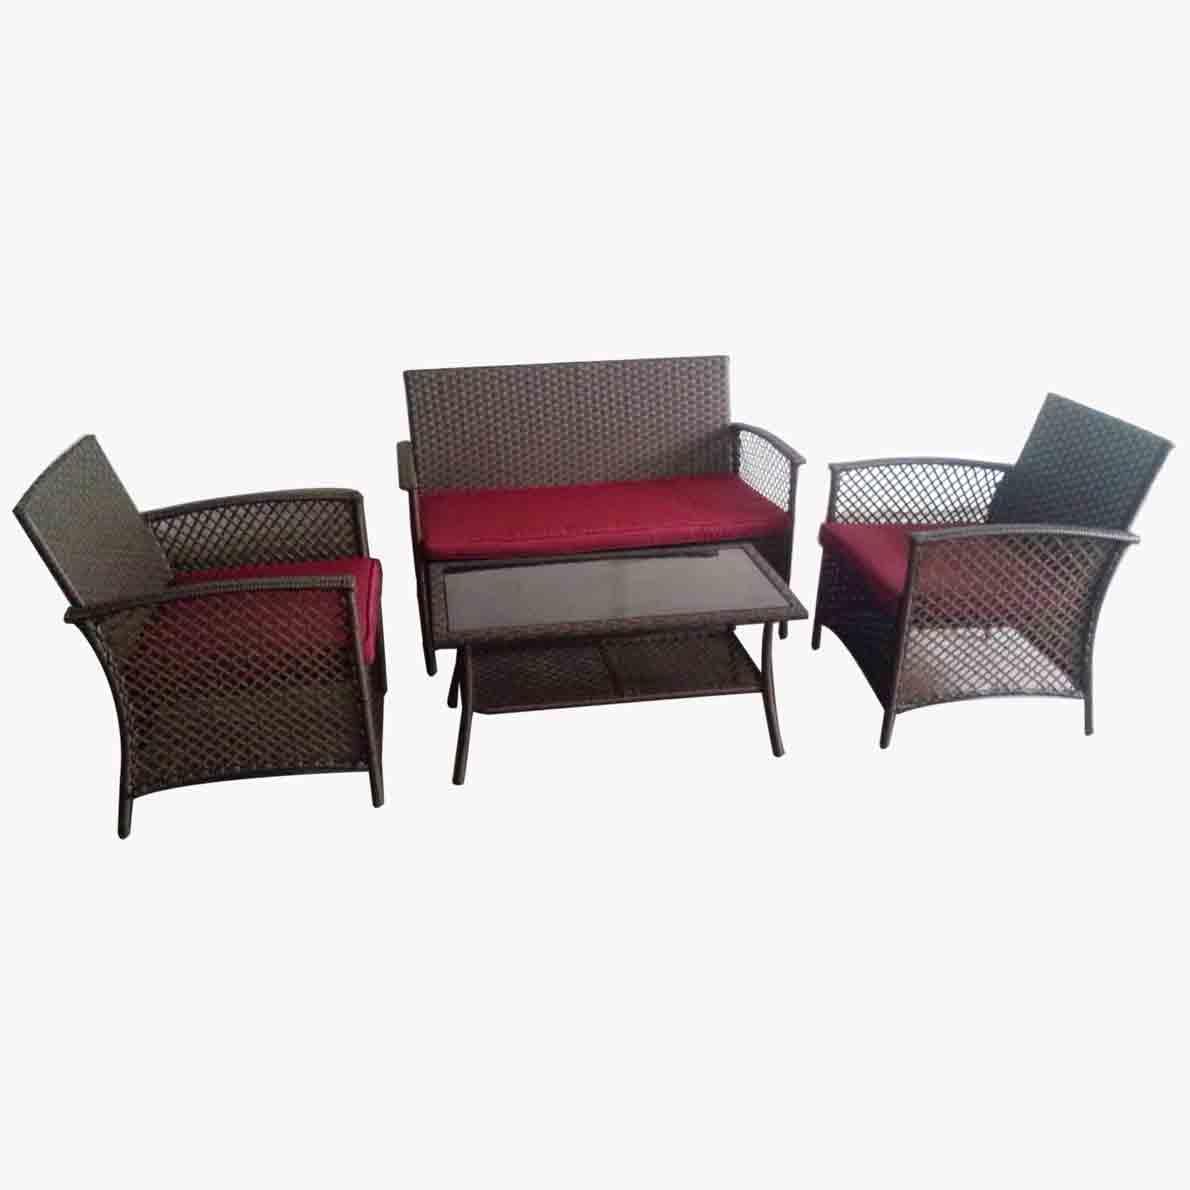 New Fashion Design for New Classic Furniture - JJS3187W Steel frame rattan 4pcs sofa set – Jin-jiang Industry